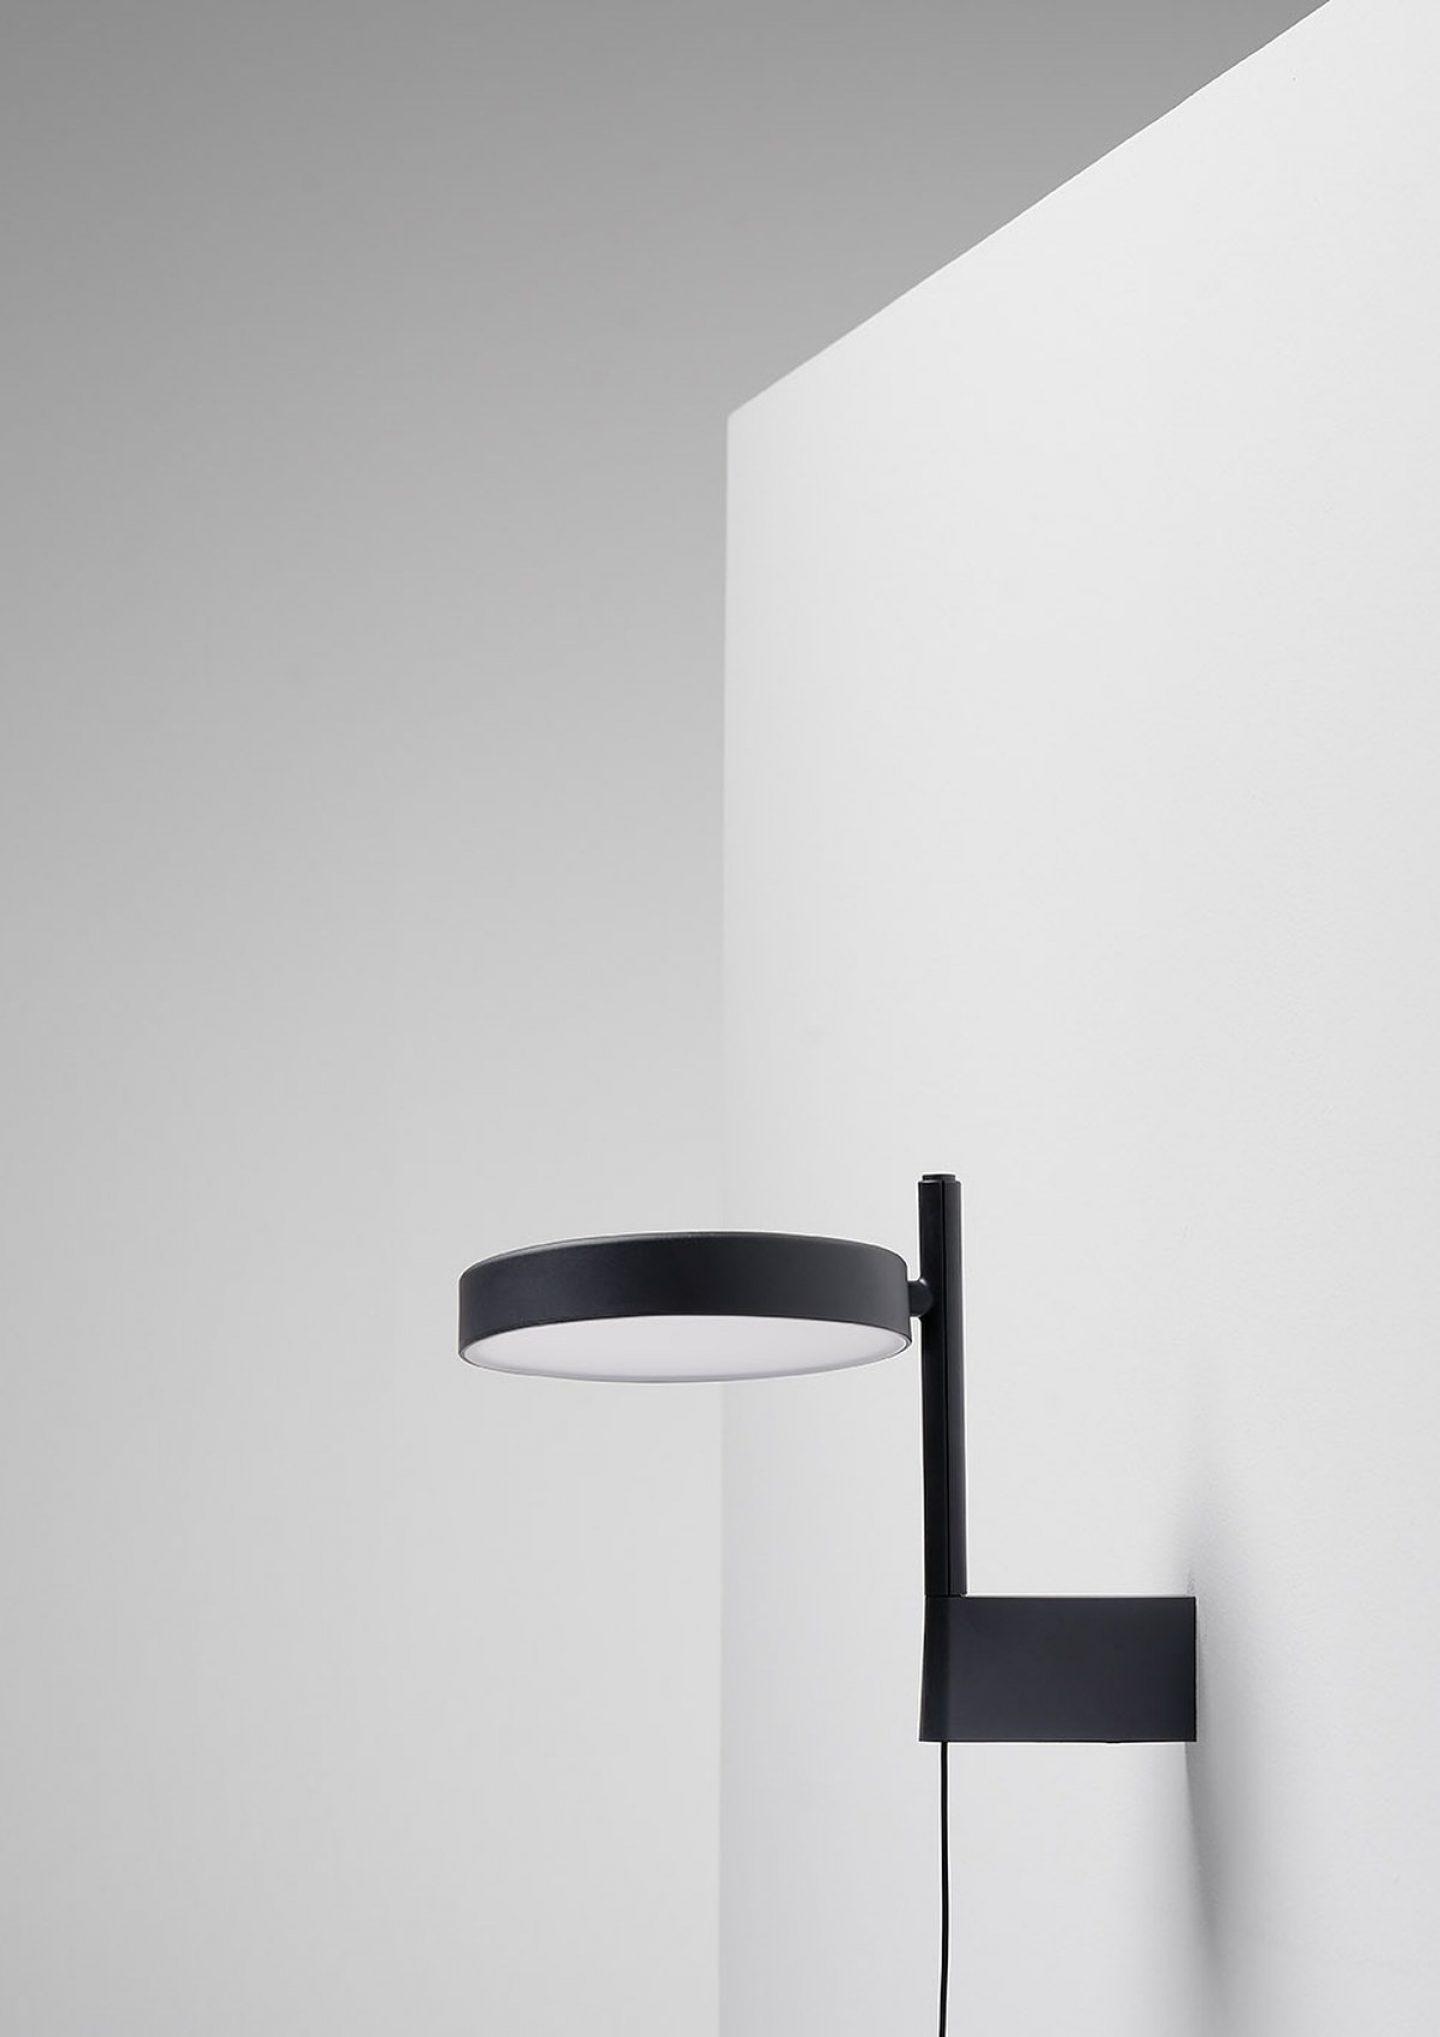 IGNANT-Design-Wastberg-w182-Pastille-05